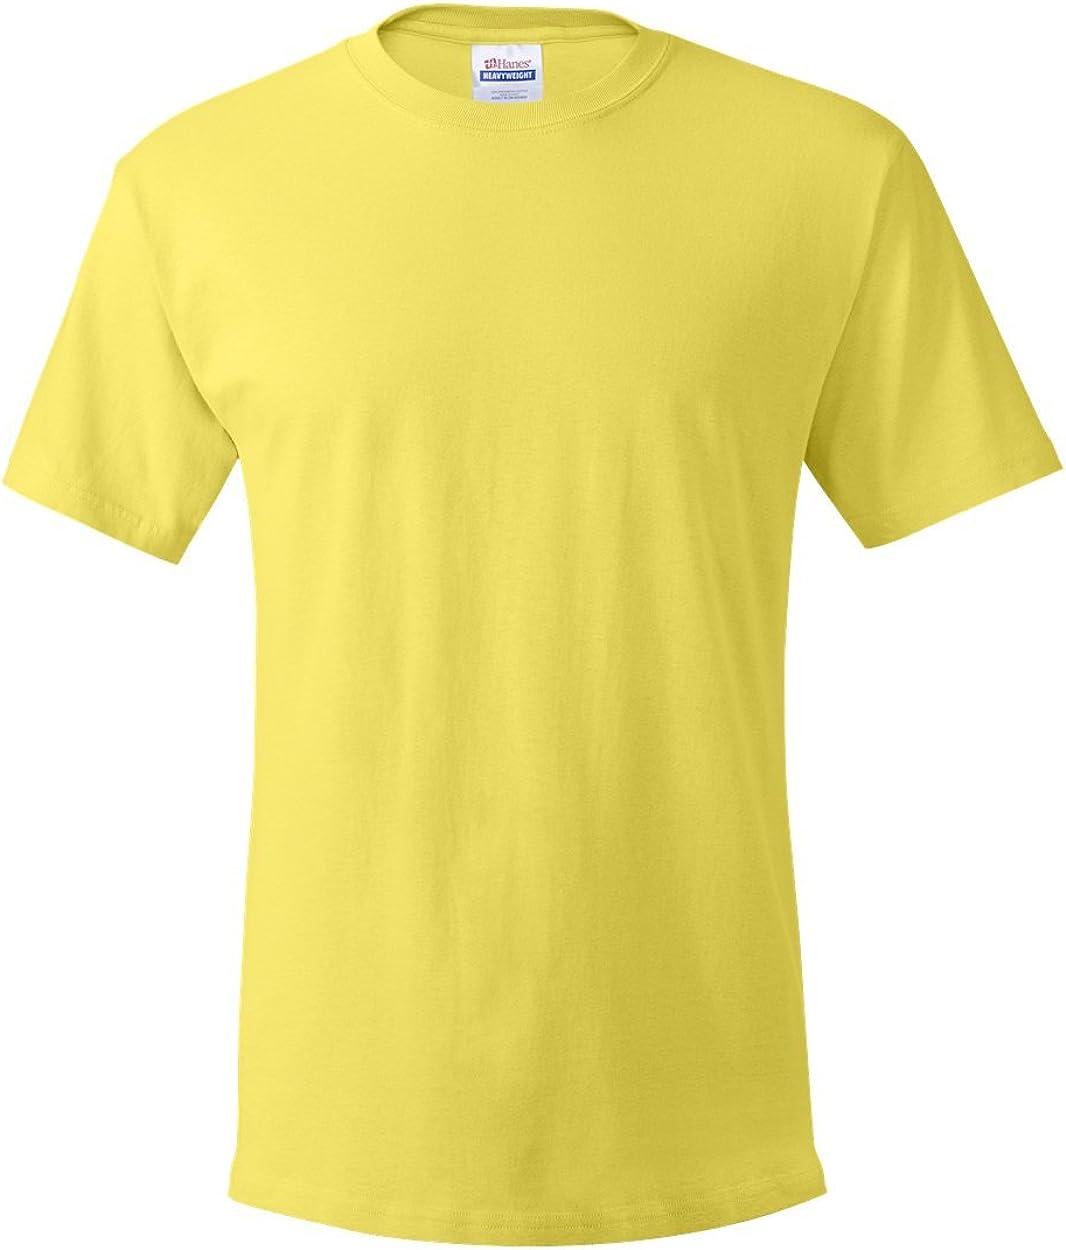 Hanes 5.2 oz. Cotton T-Shirt (5280)